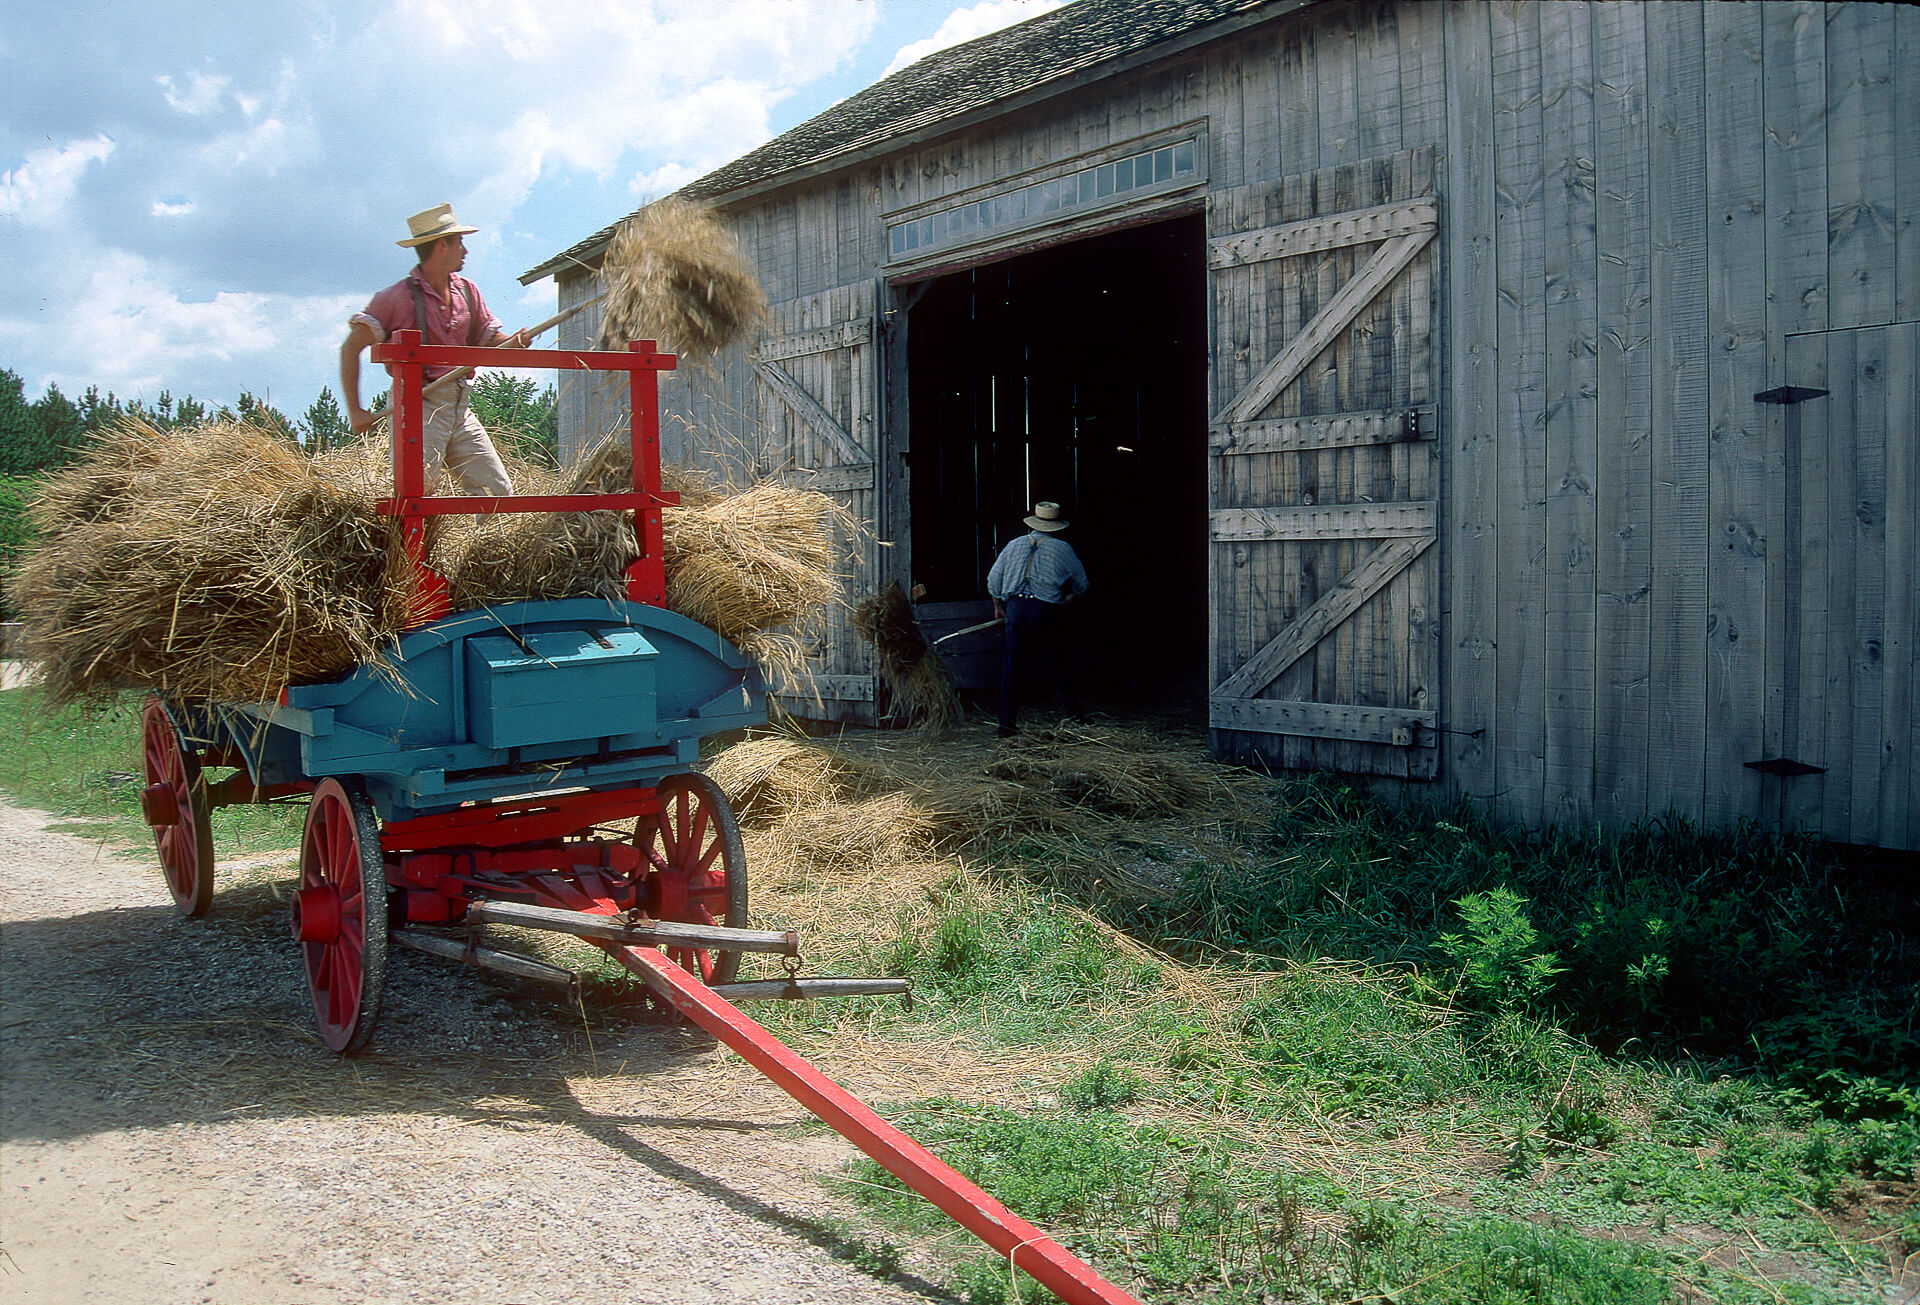 Haywagon at Old World Wisconsin